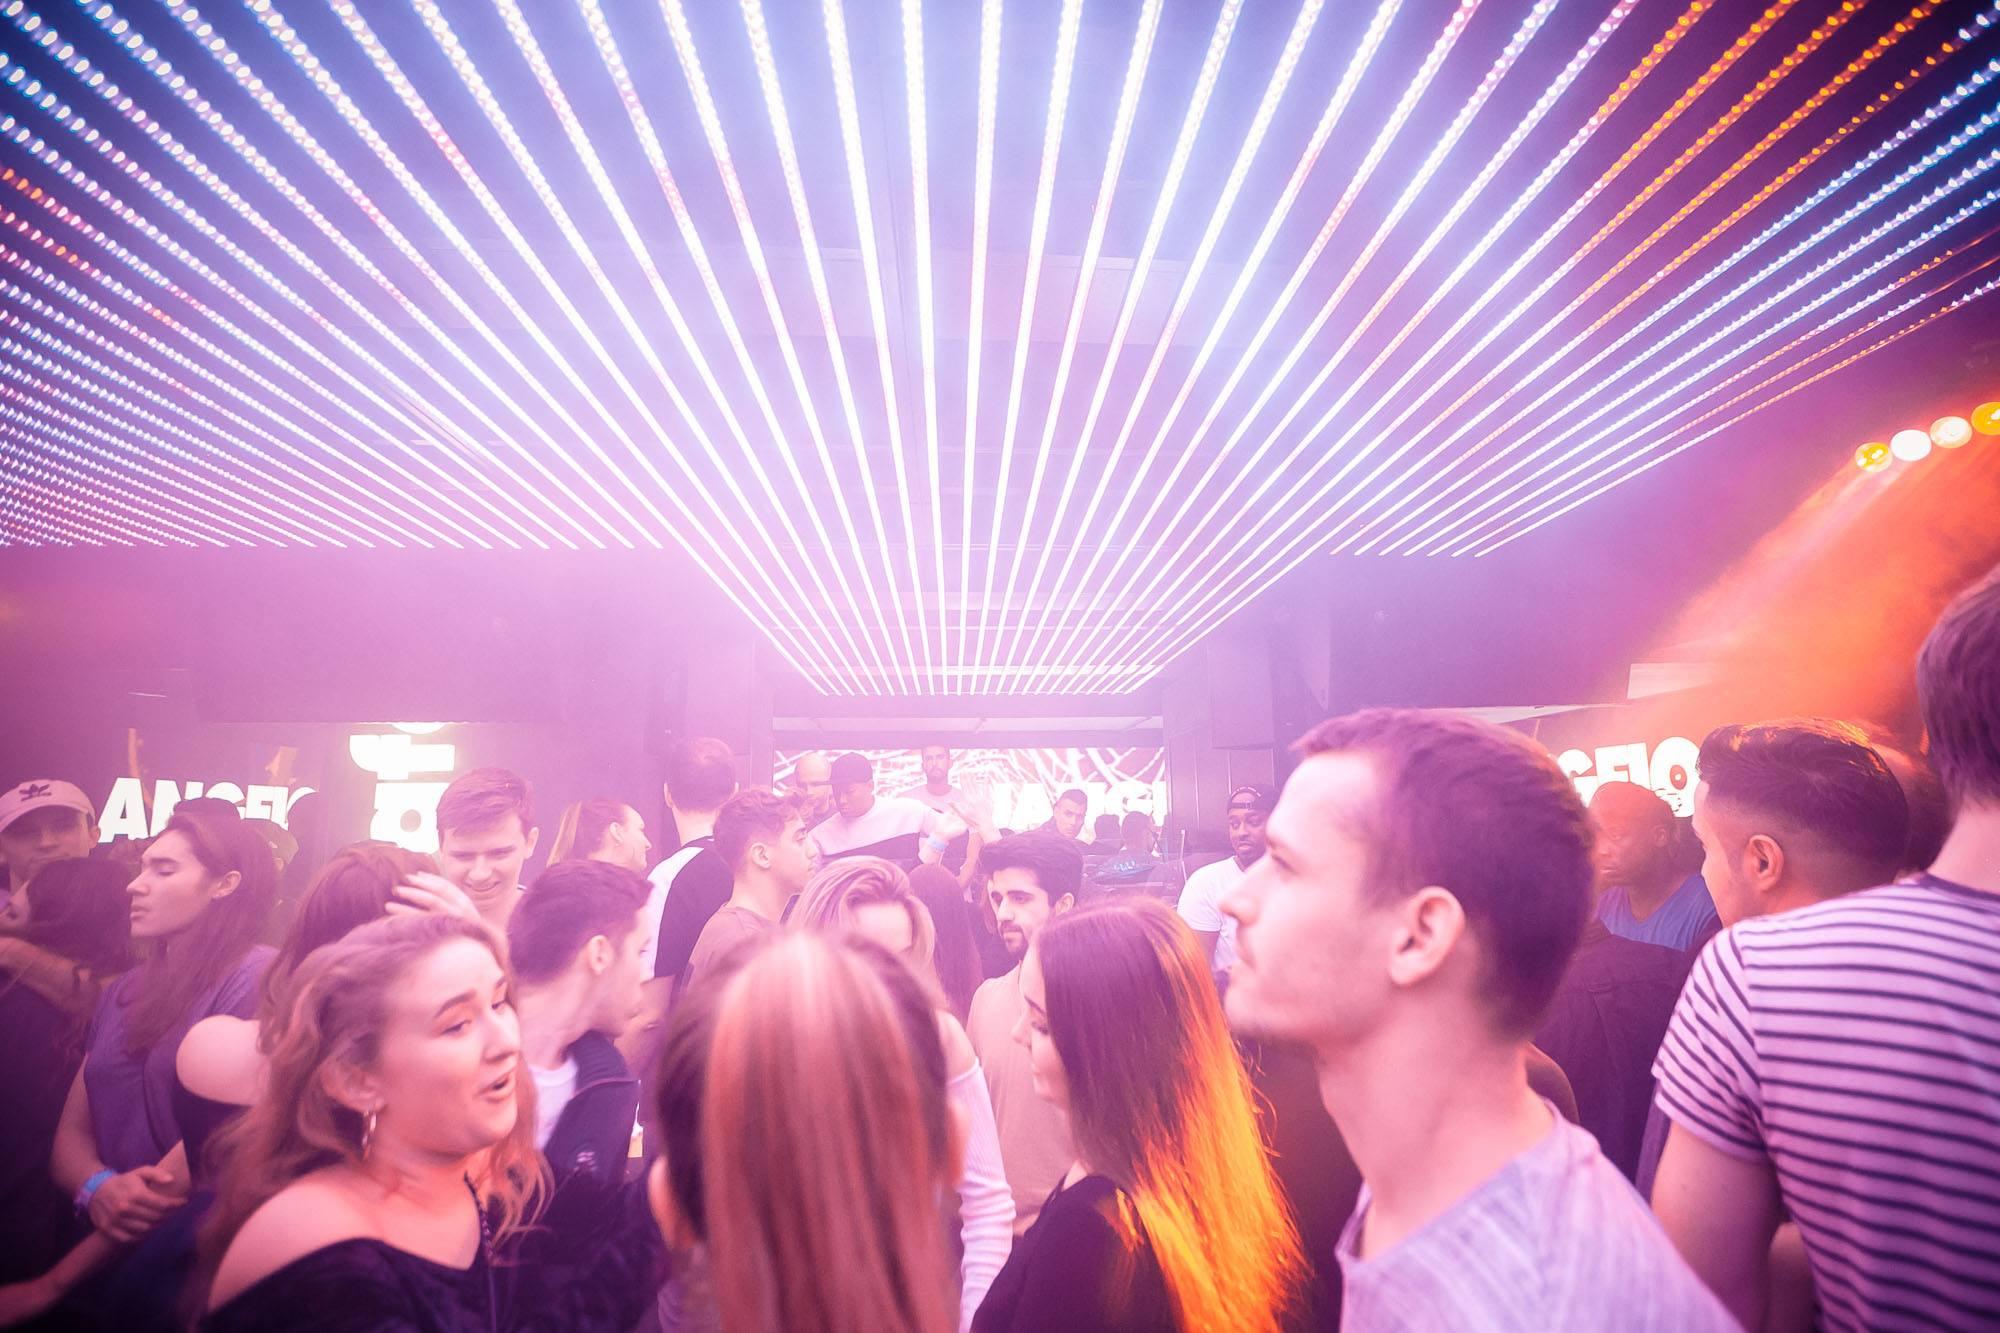 Crowded dance area in night club Trafo.